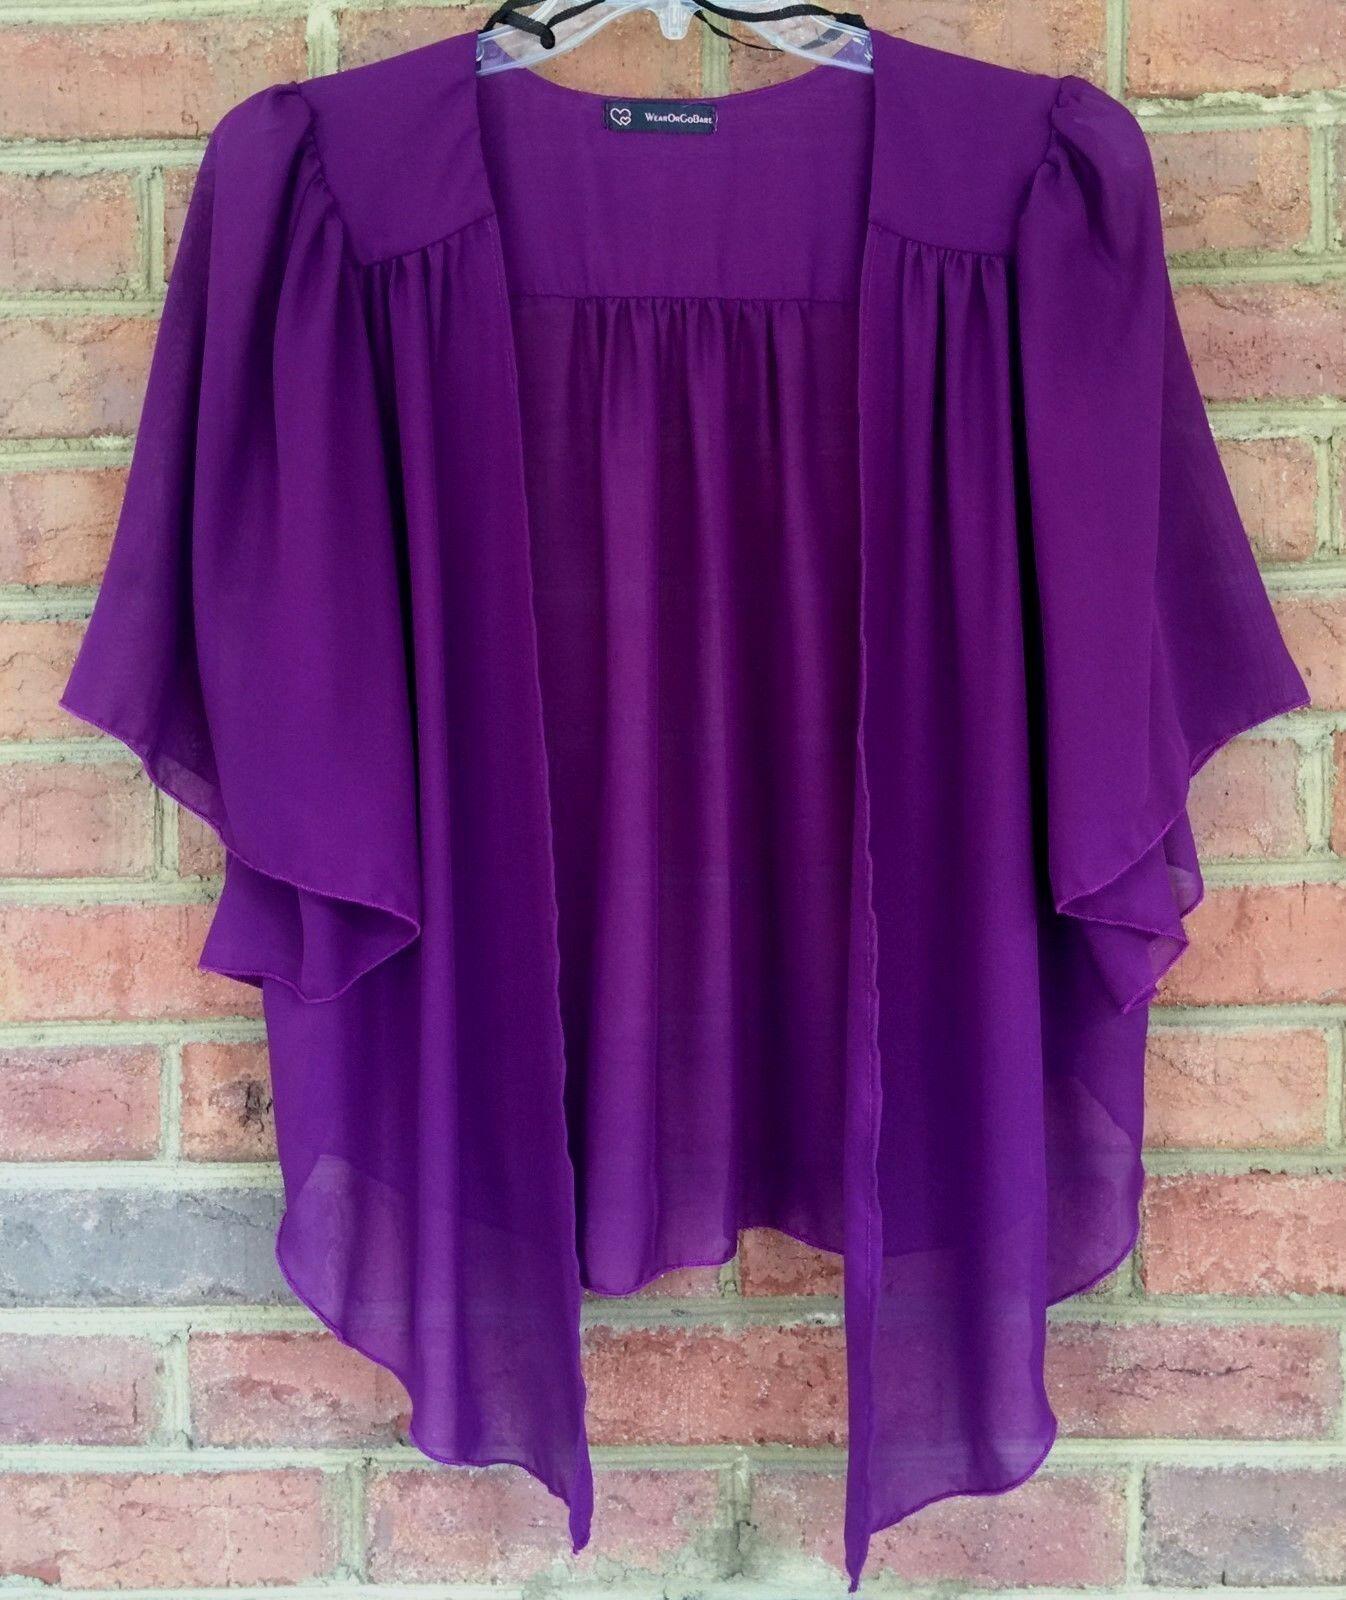 Plus Size Eggplant Purple Chiffon Cardigan Bolero Top WearOrGoBare ...